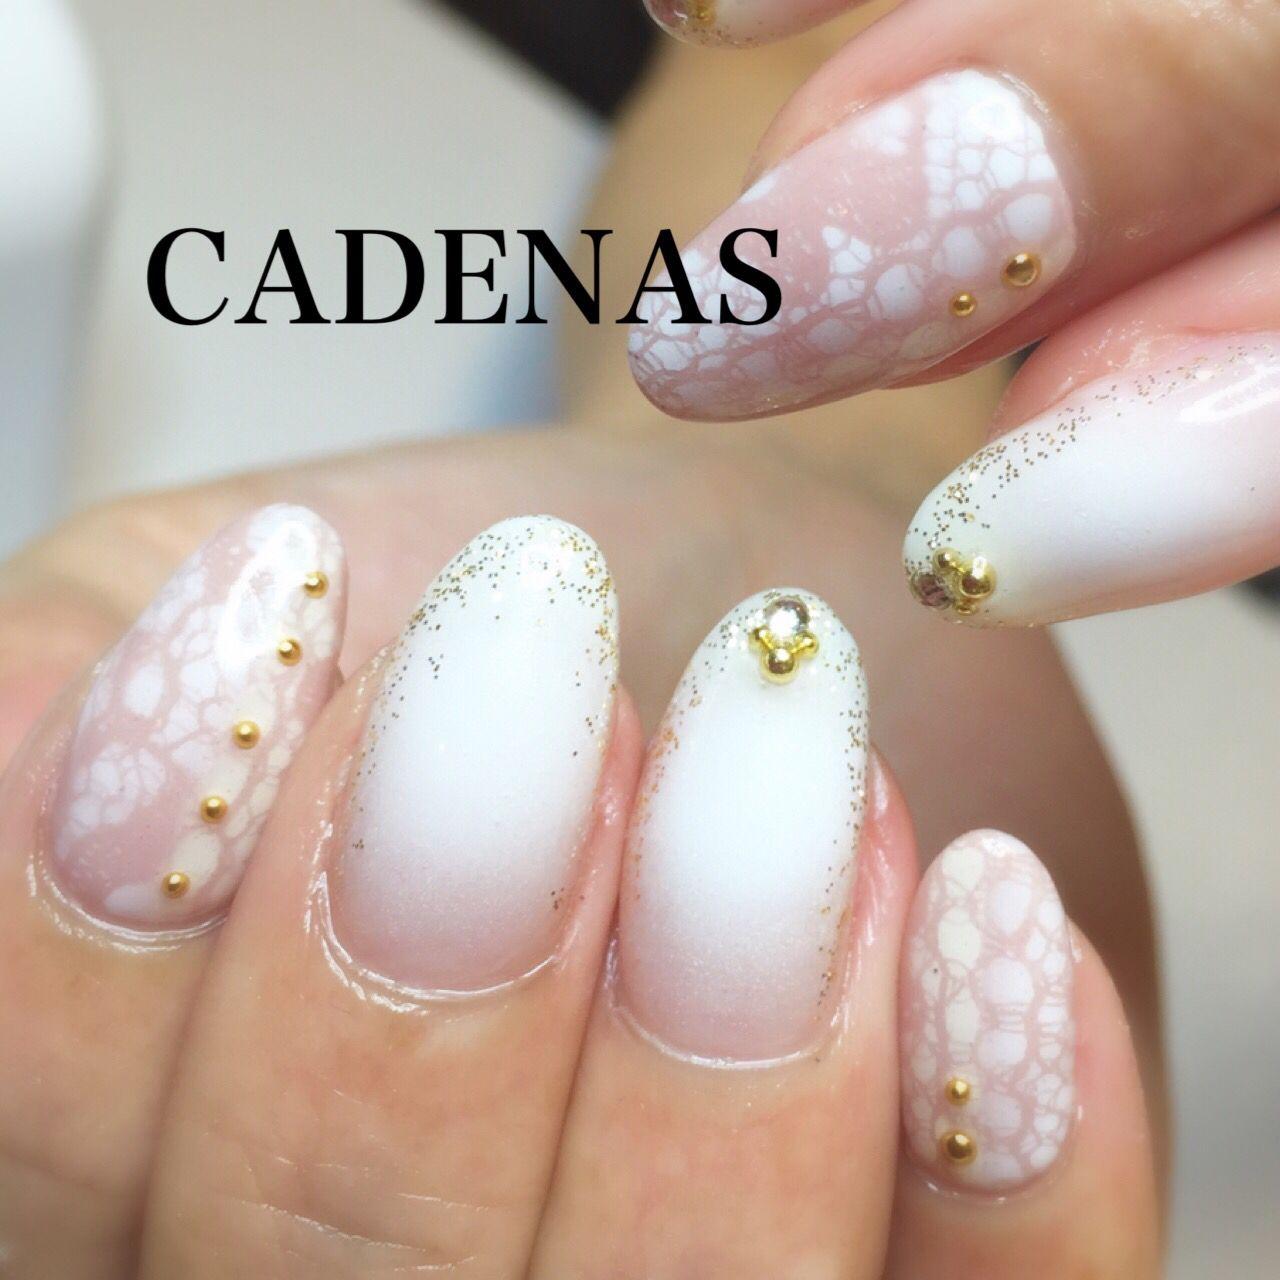 Cadenas nail design ♡ tel:06-4792-8617 blog❤ http://ameblo.jp ...